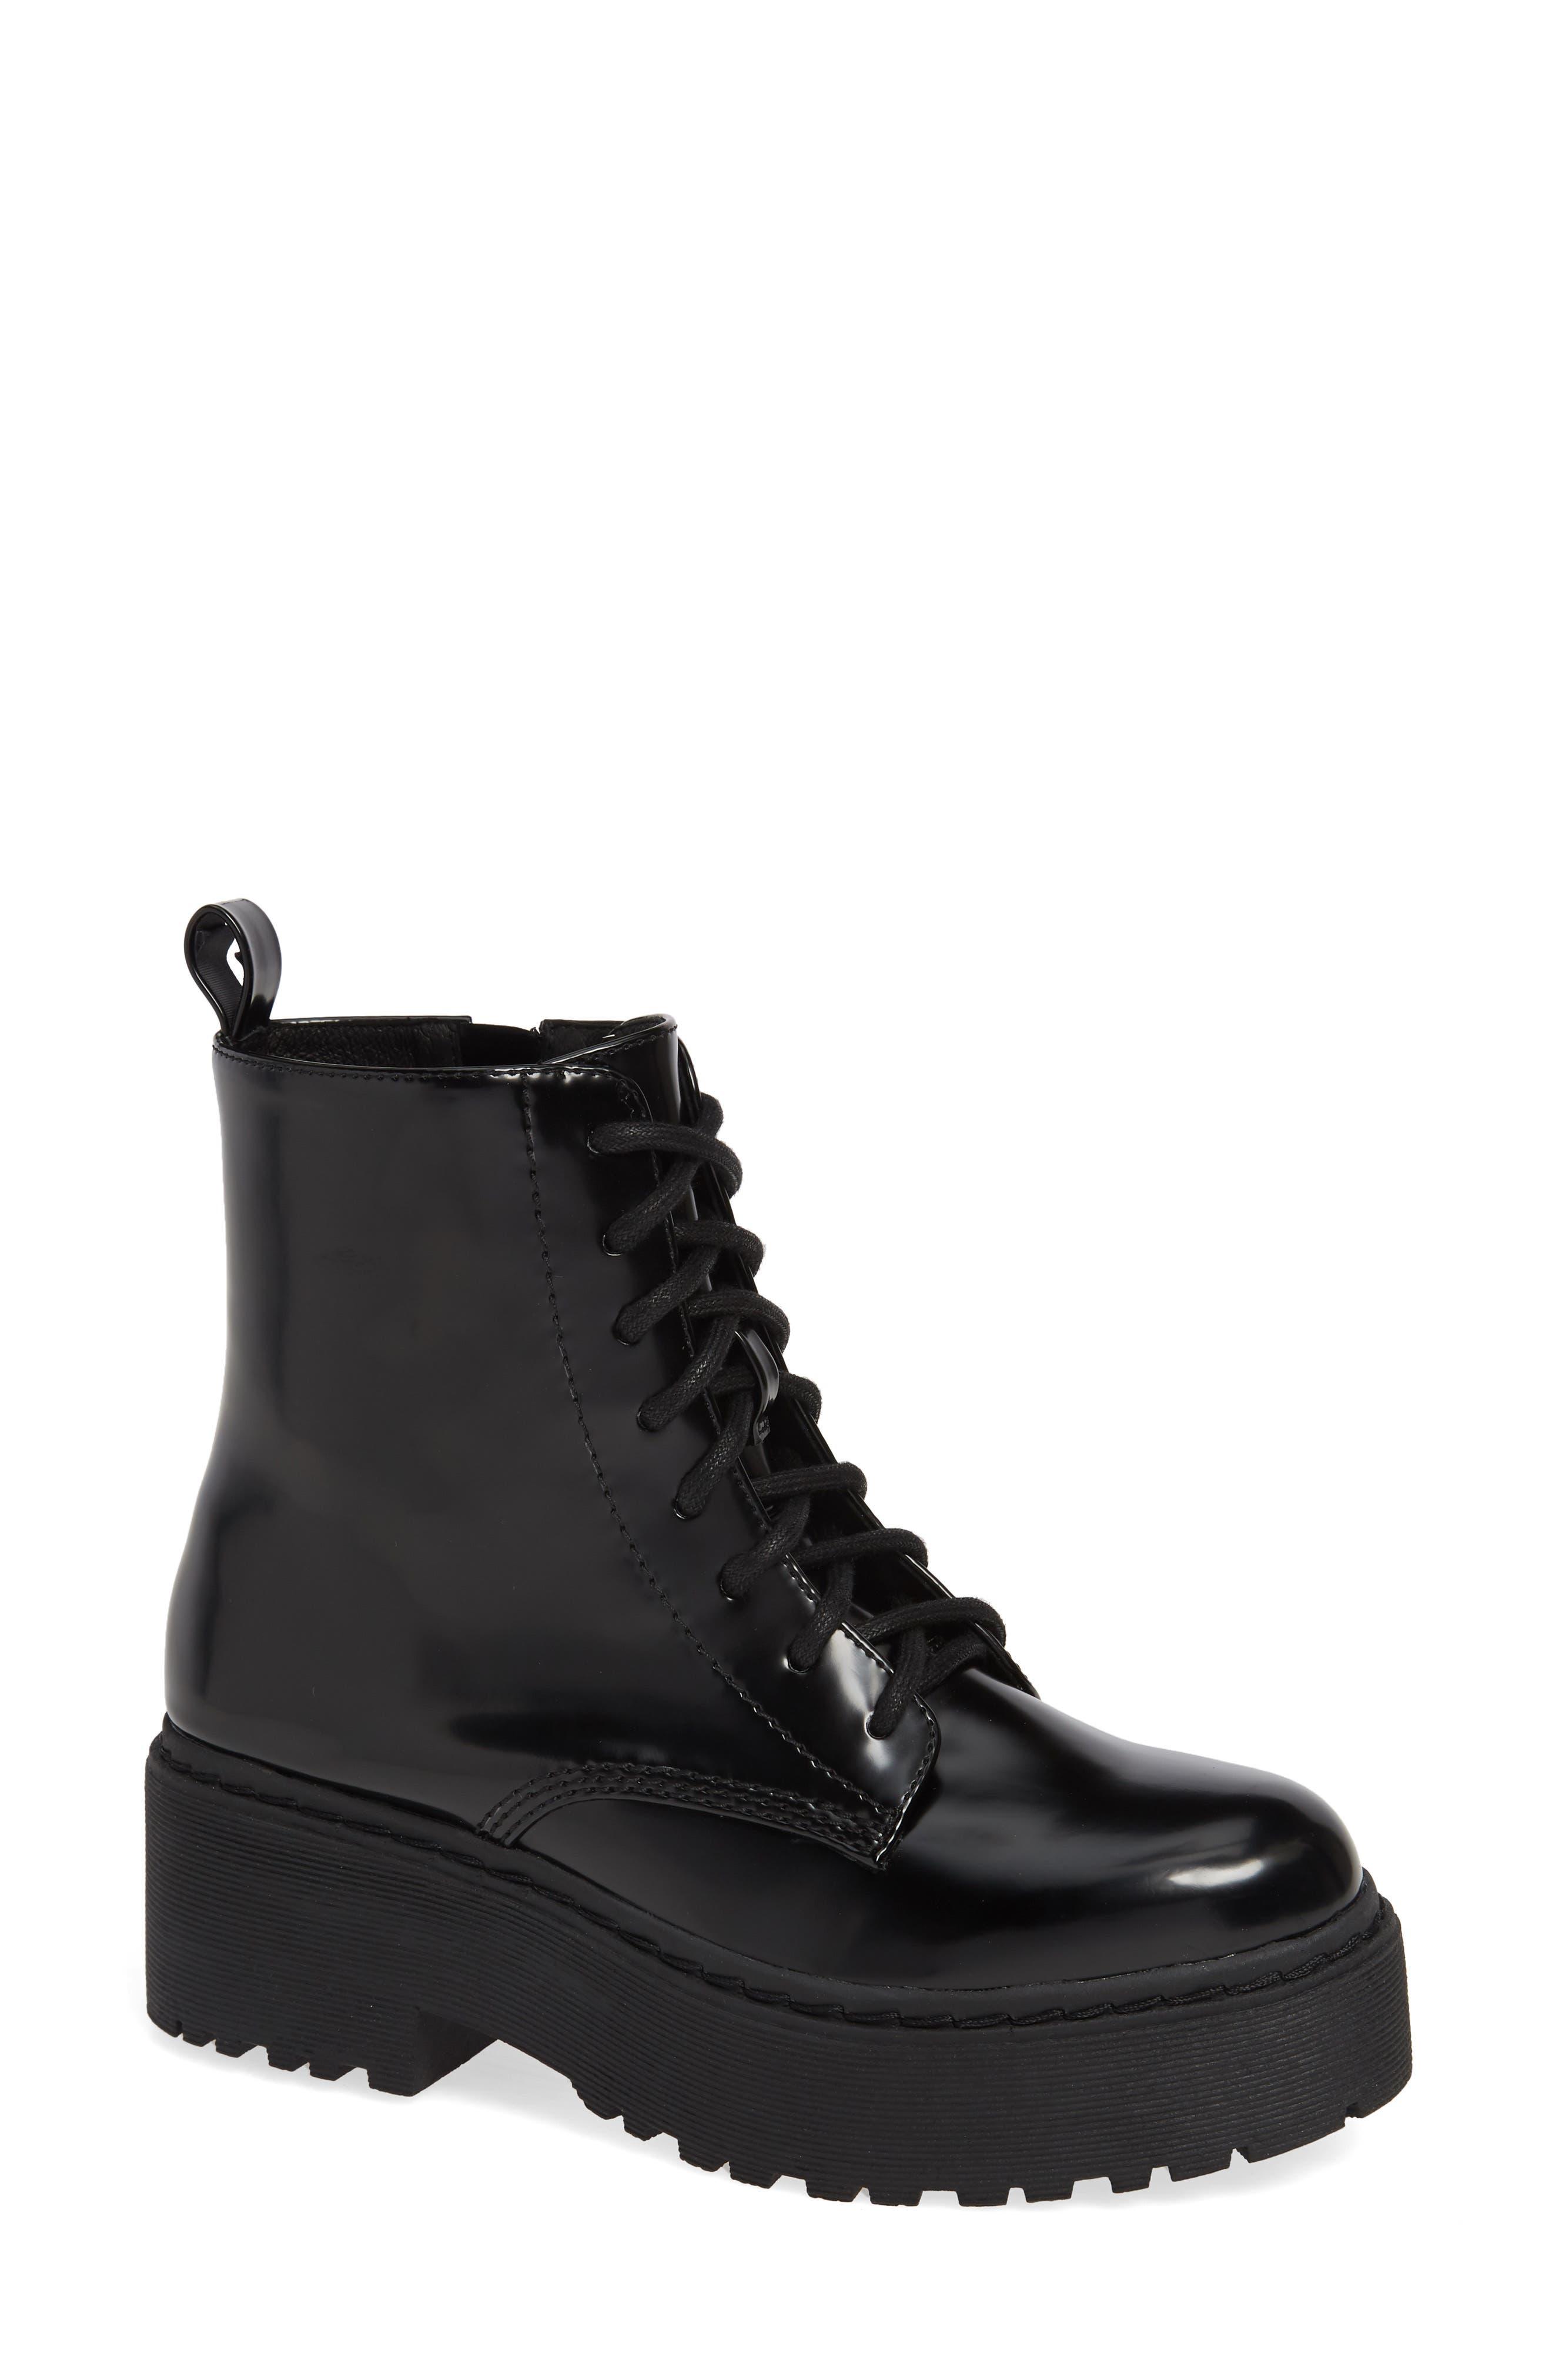 Jeffrey Campbell District Combat Boot, Black